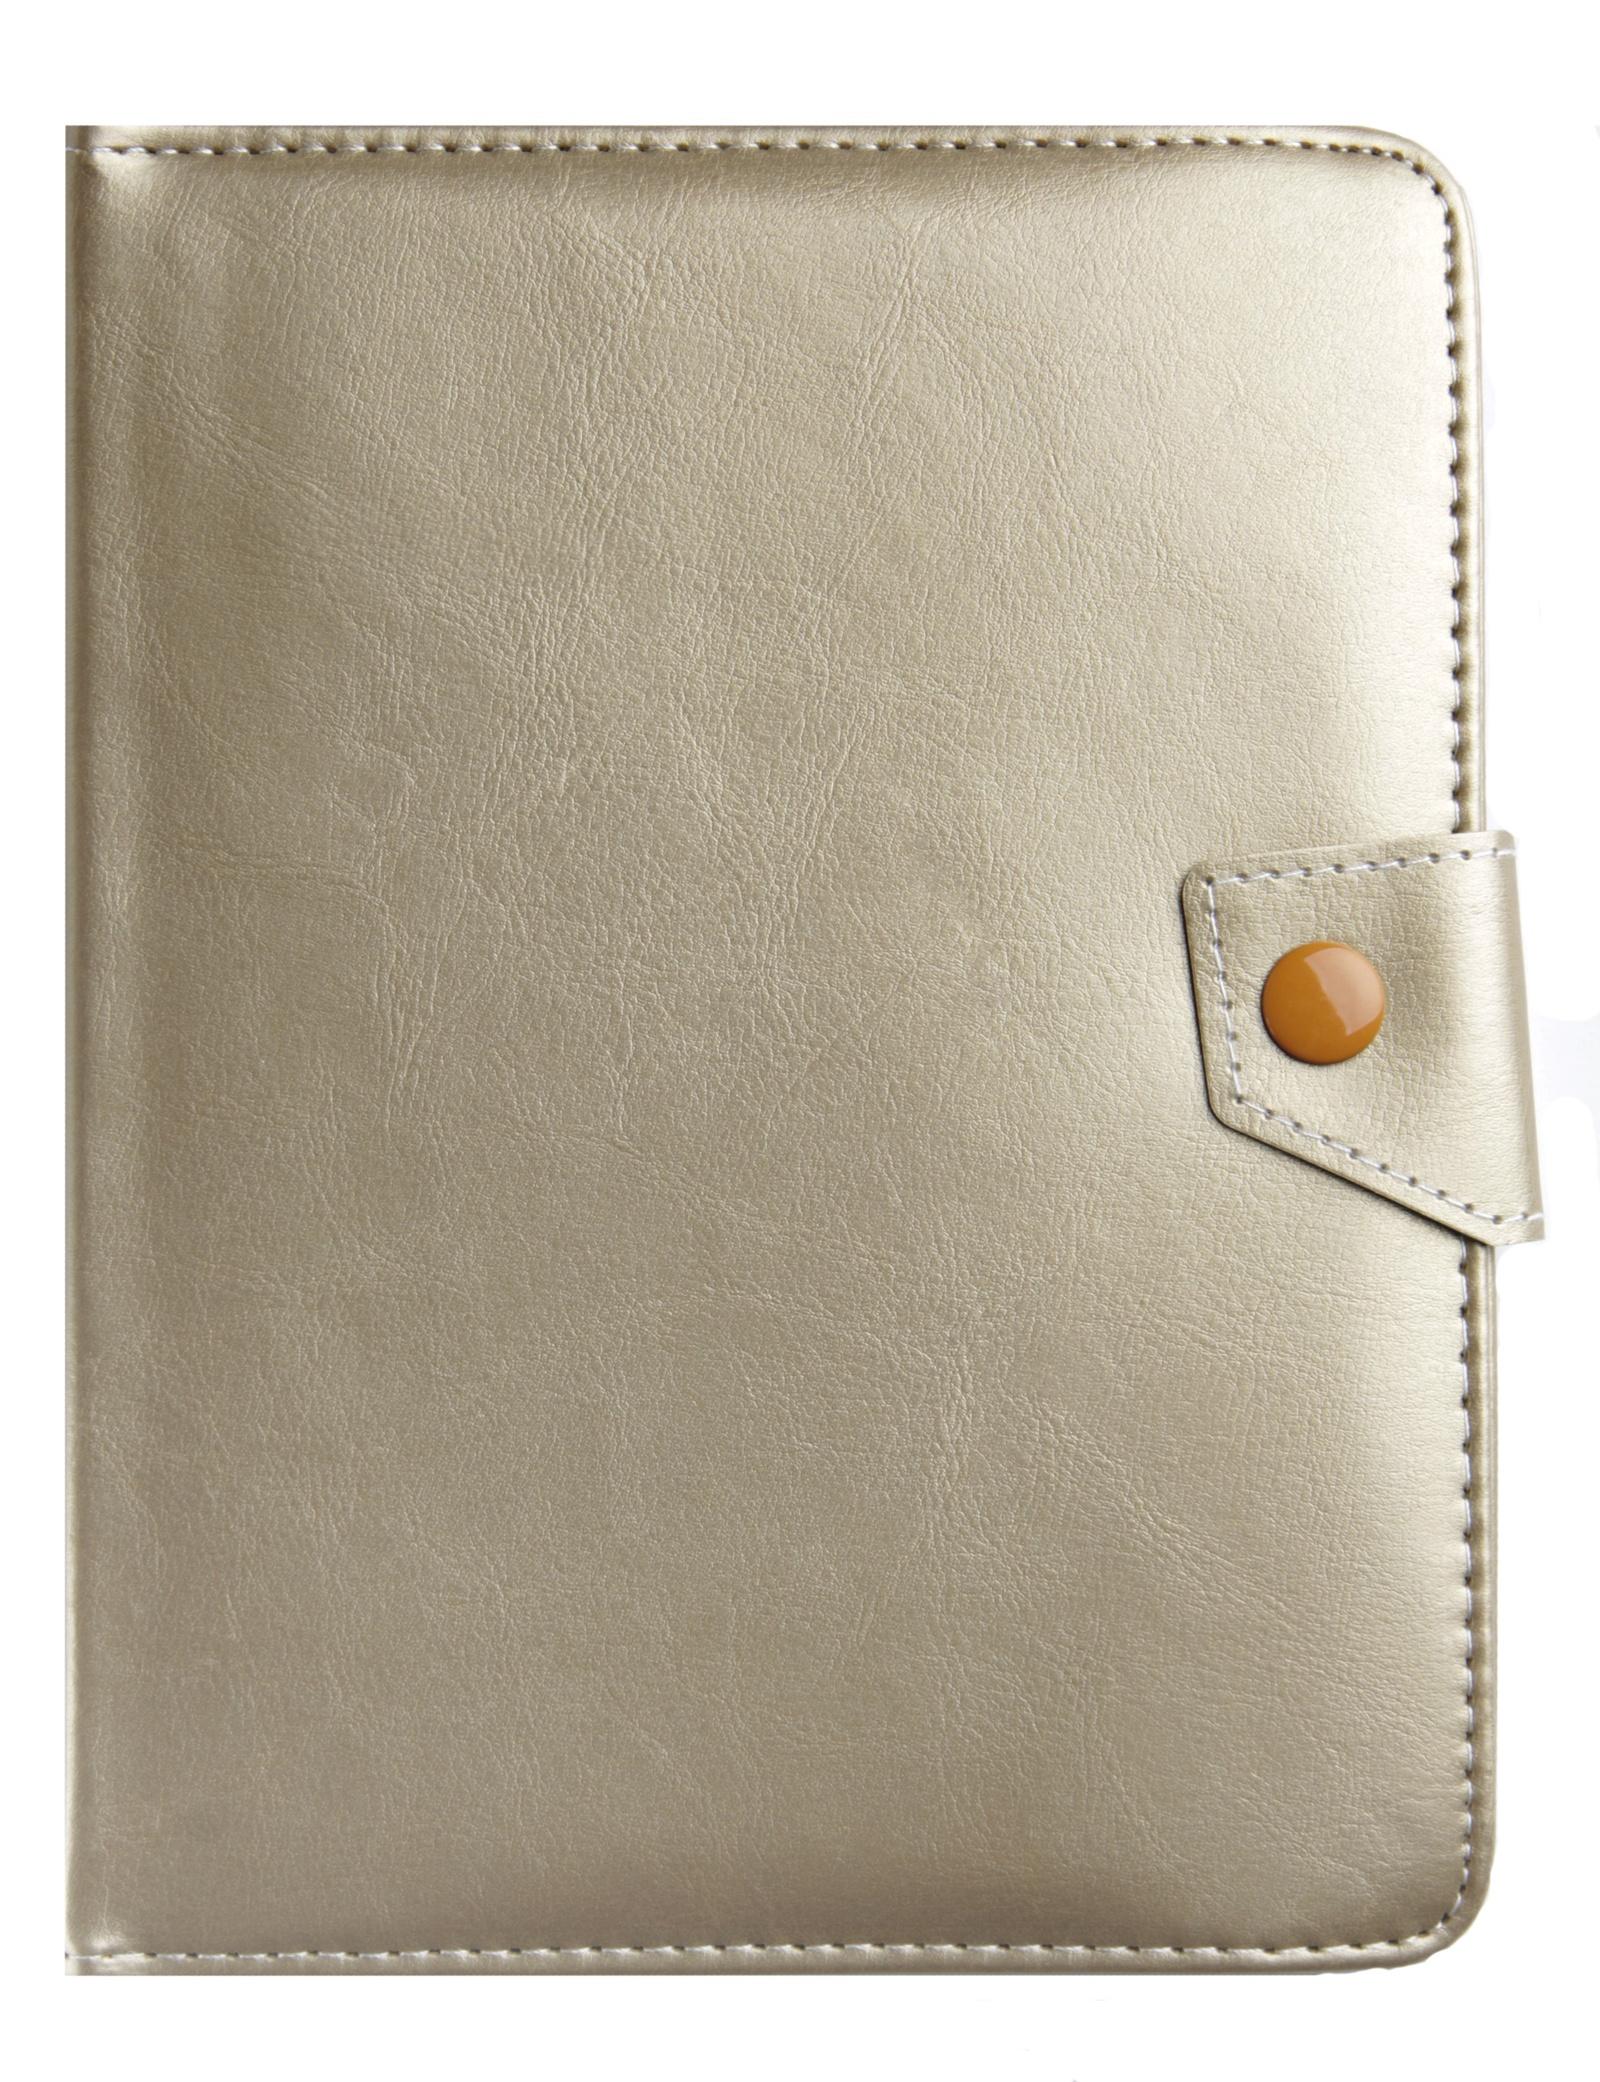 Чехол для планшета ProShield Standard clips8, 4630042525696, золотой чехол универсальный proshield standard clips8 2000000139876 золотистый